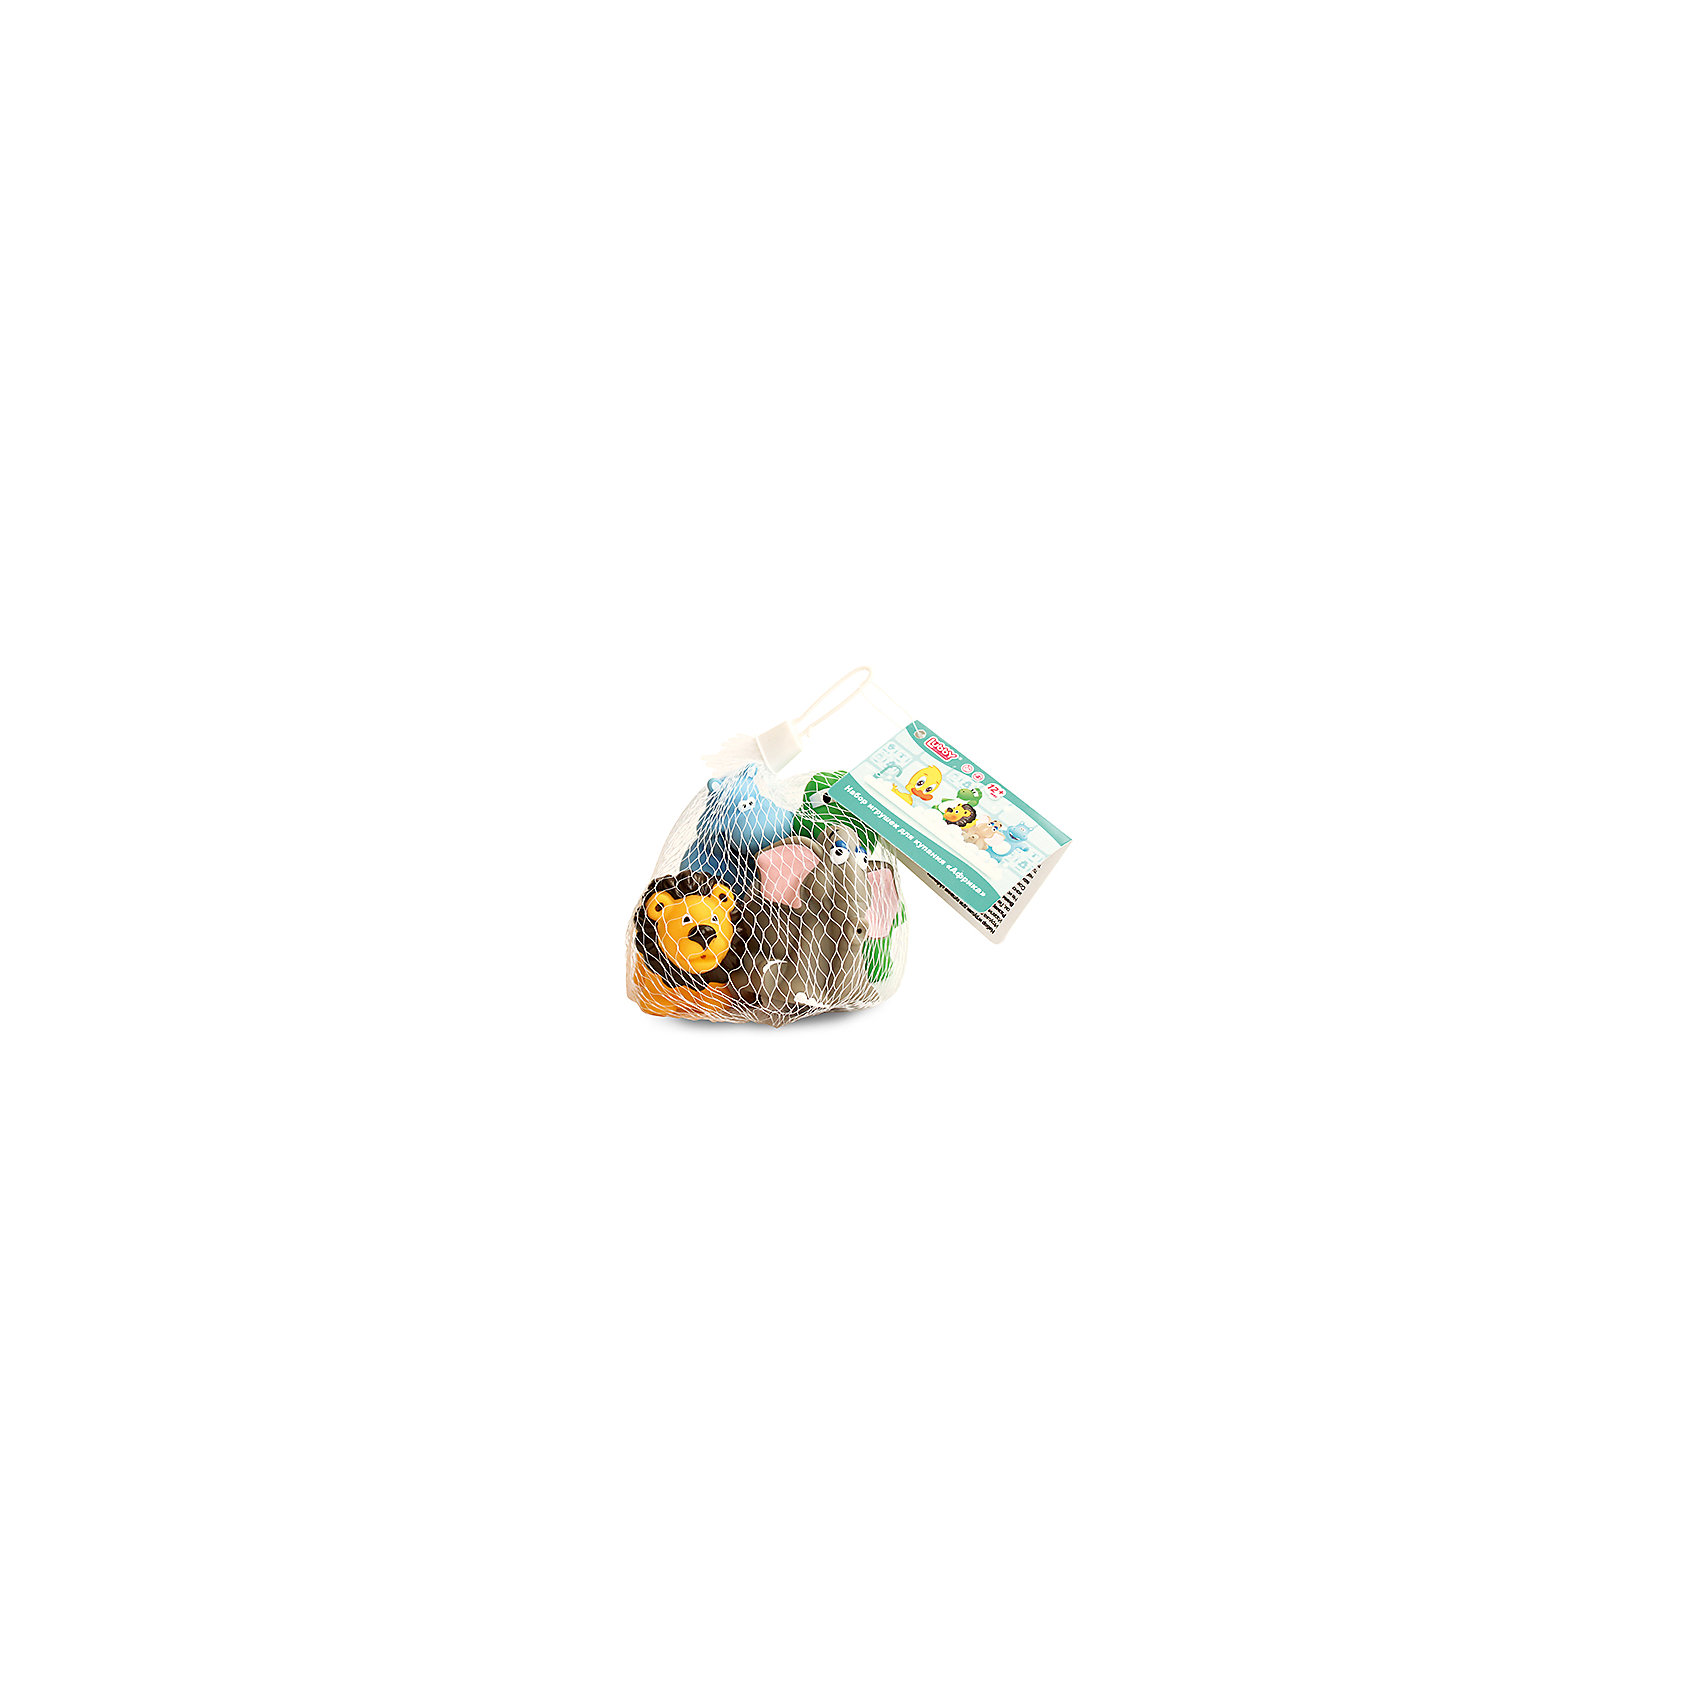 Набор игрушек для купания Африка от 12 мес., 4 шт., LUBBY